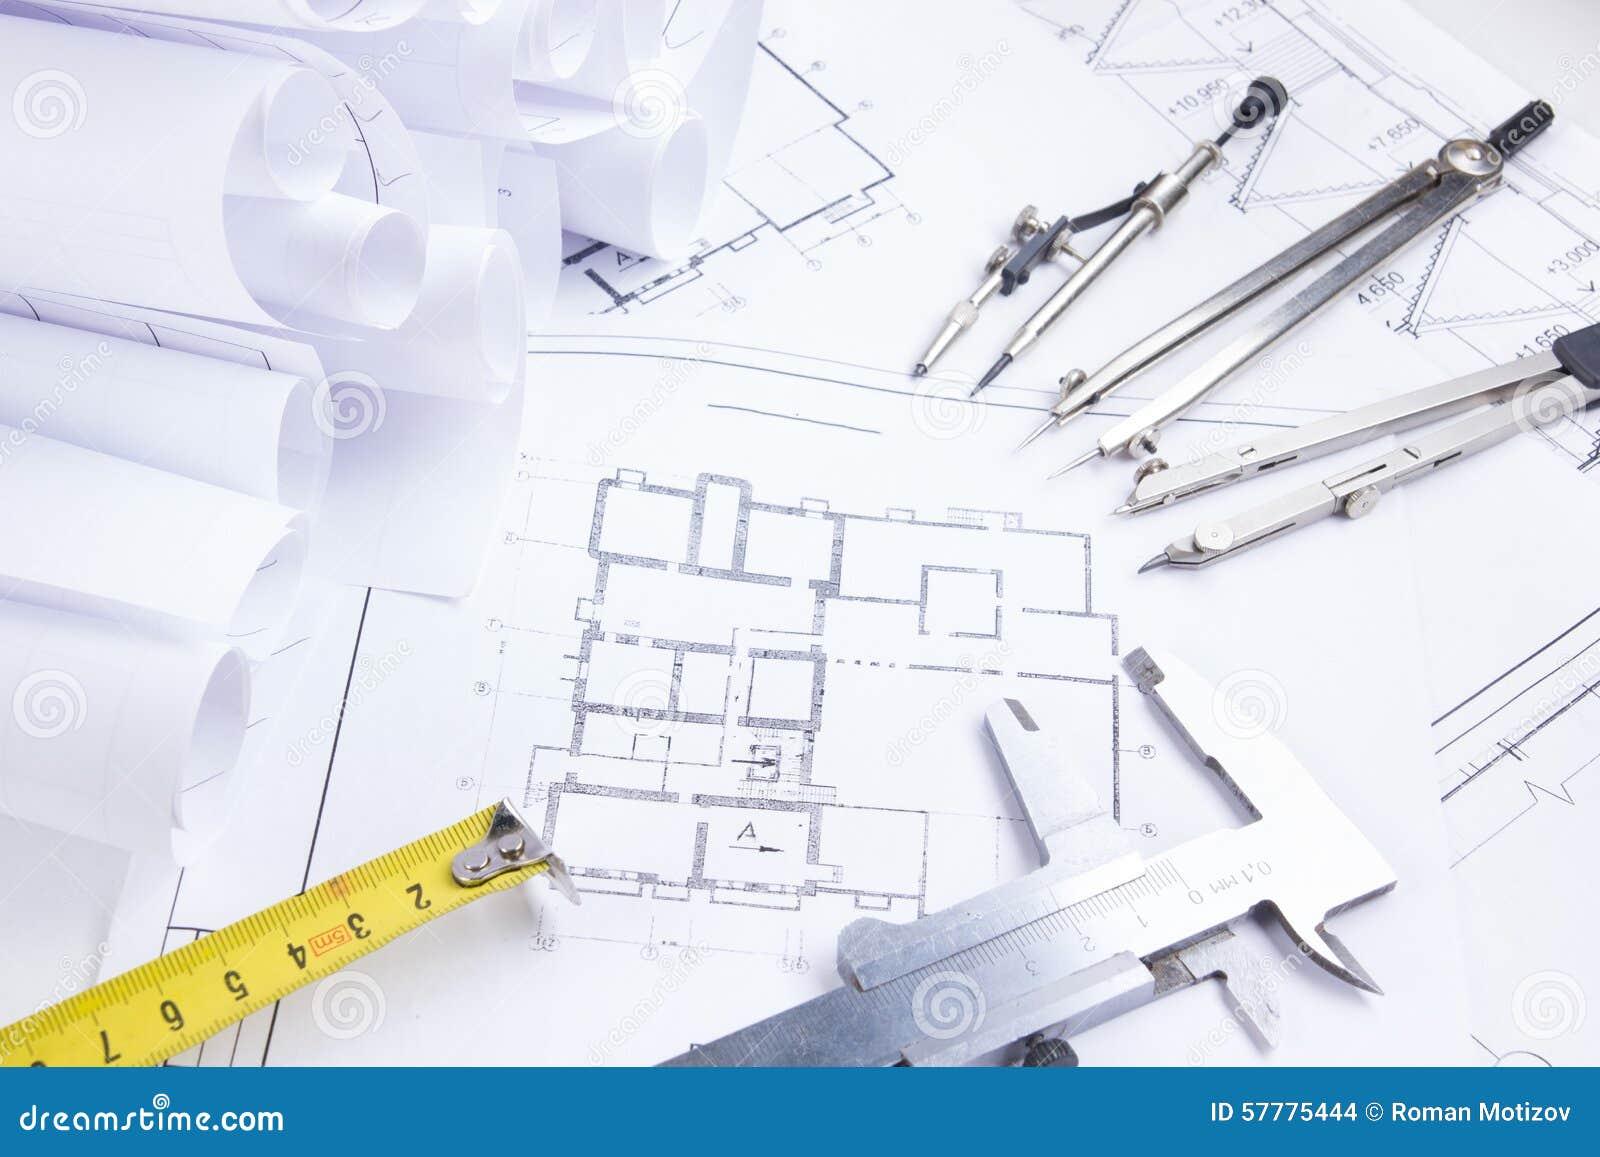 Engineering plans royalty free stock image cartoondealer for Engineered plans